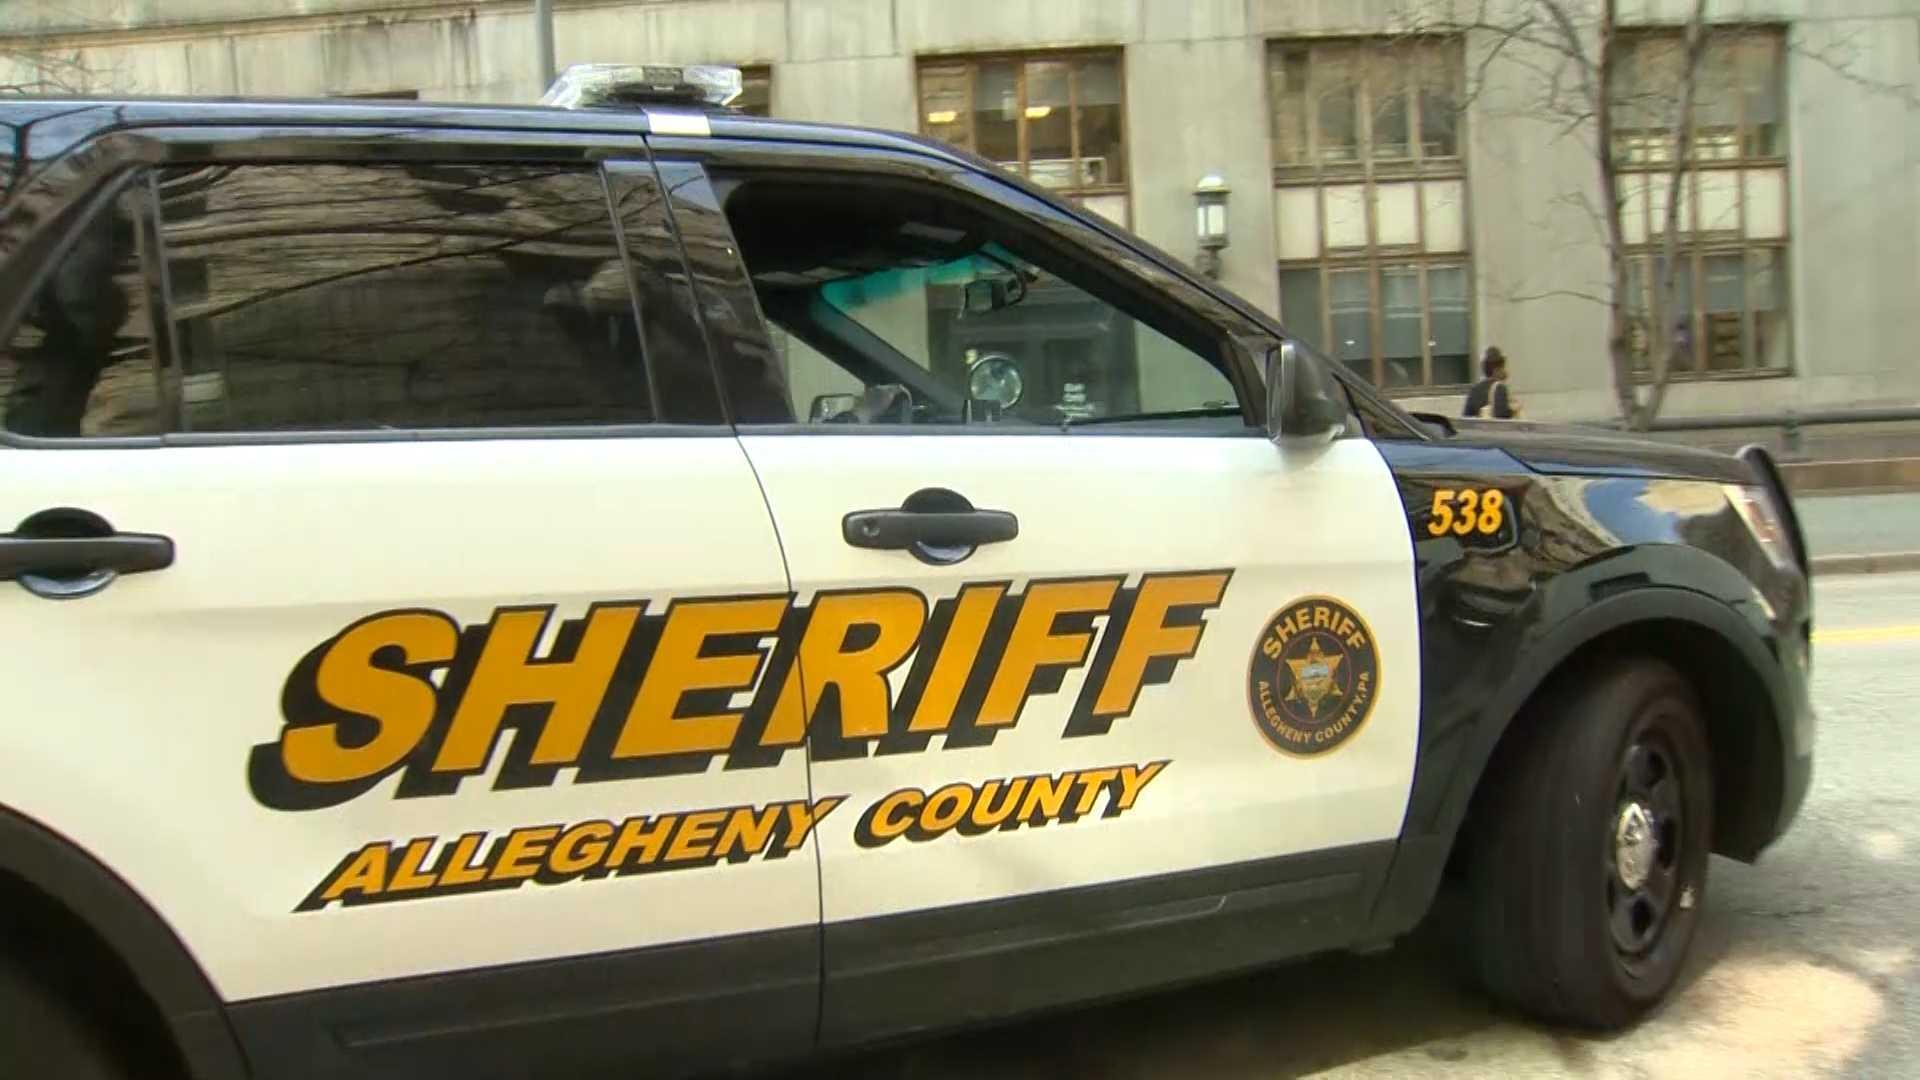 Allegheny County Sheriff